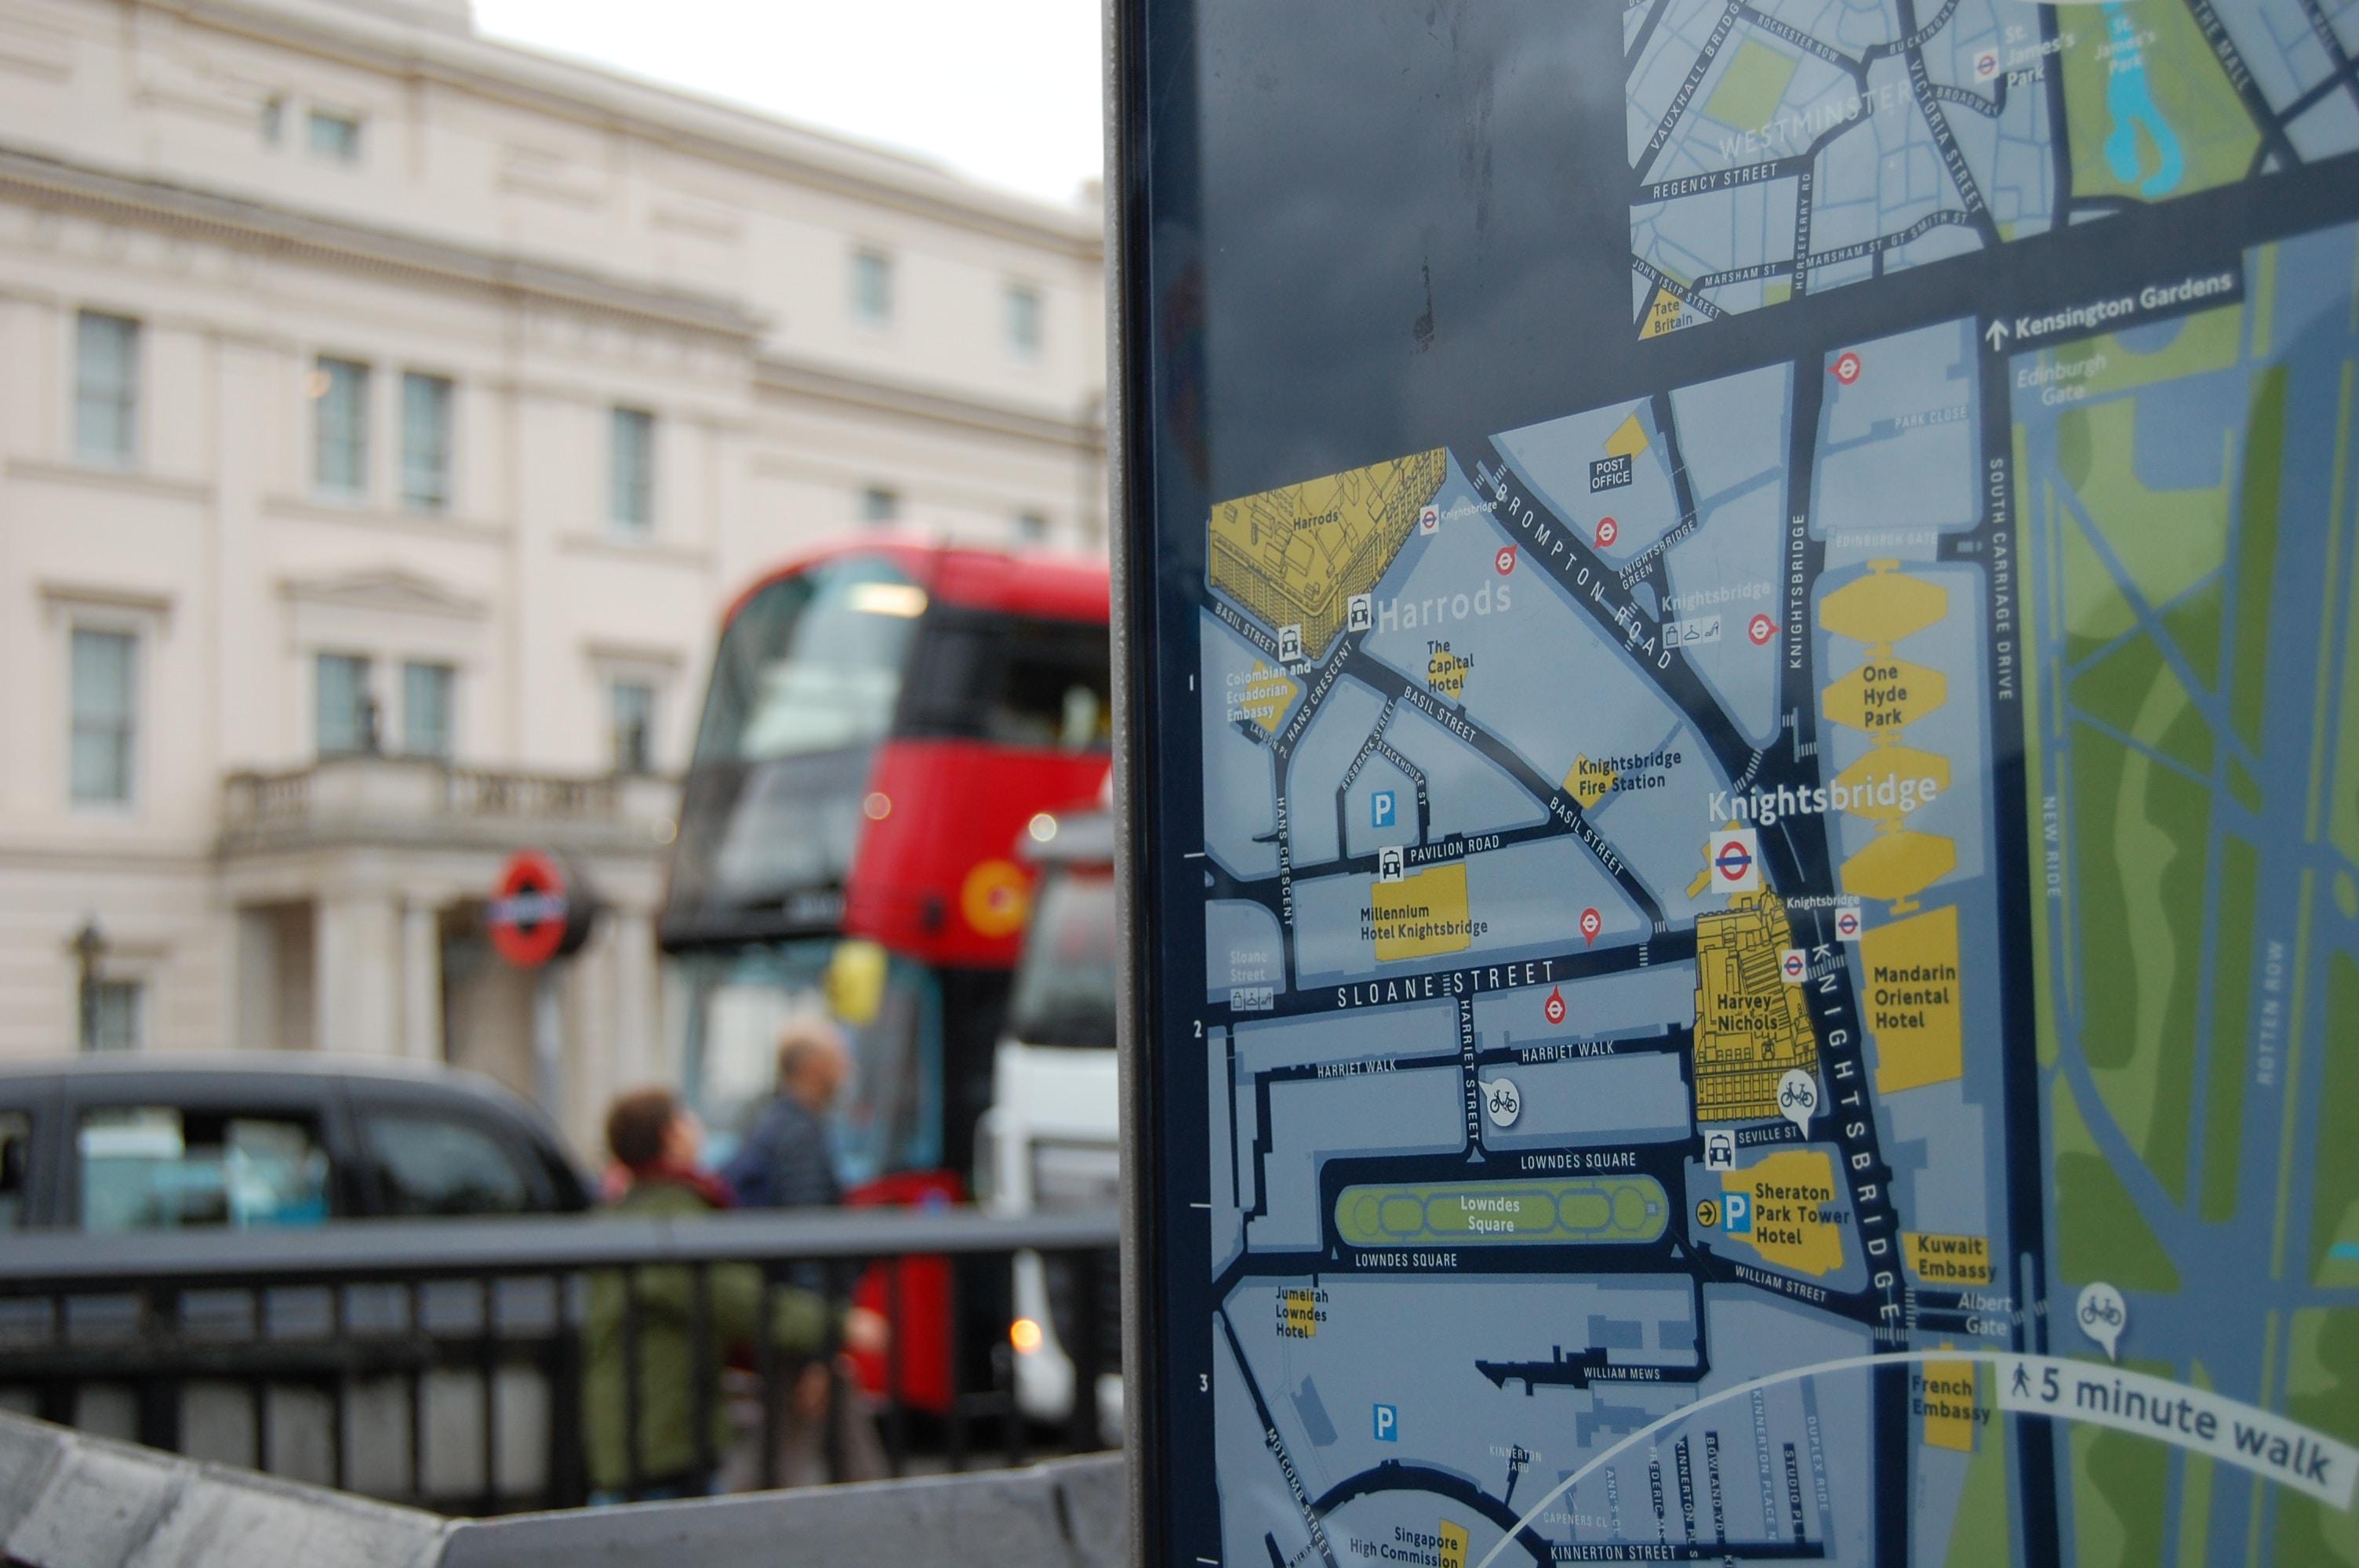 photo of monitor displaying digital map